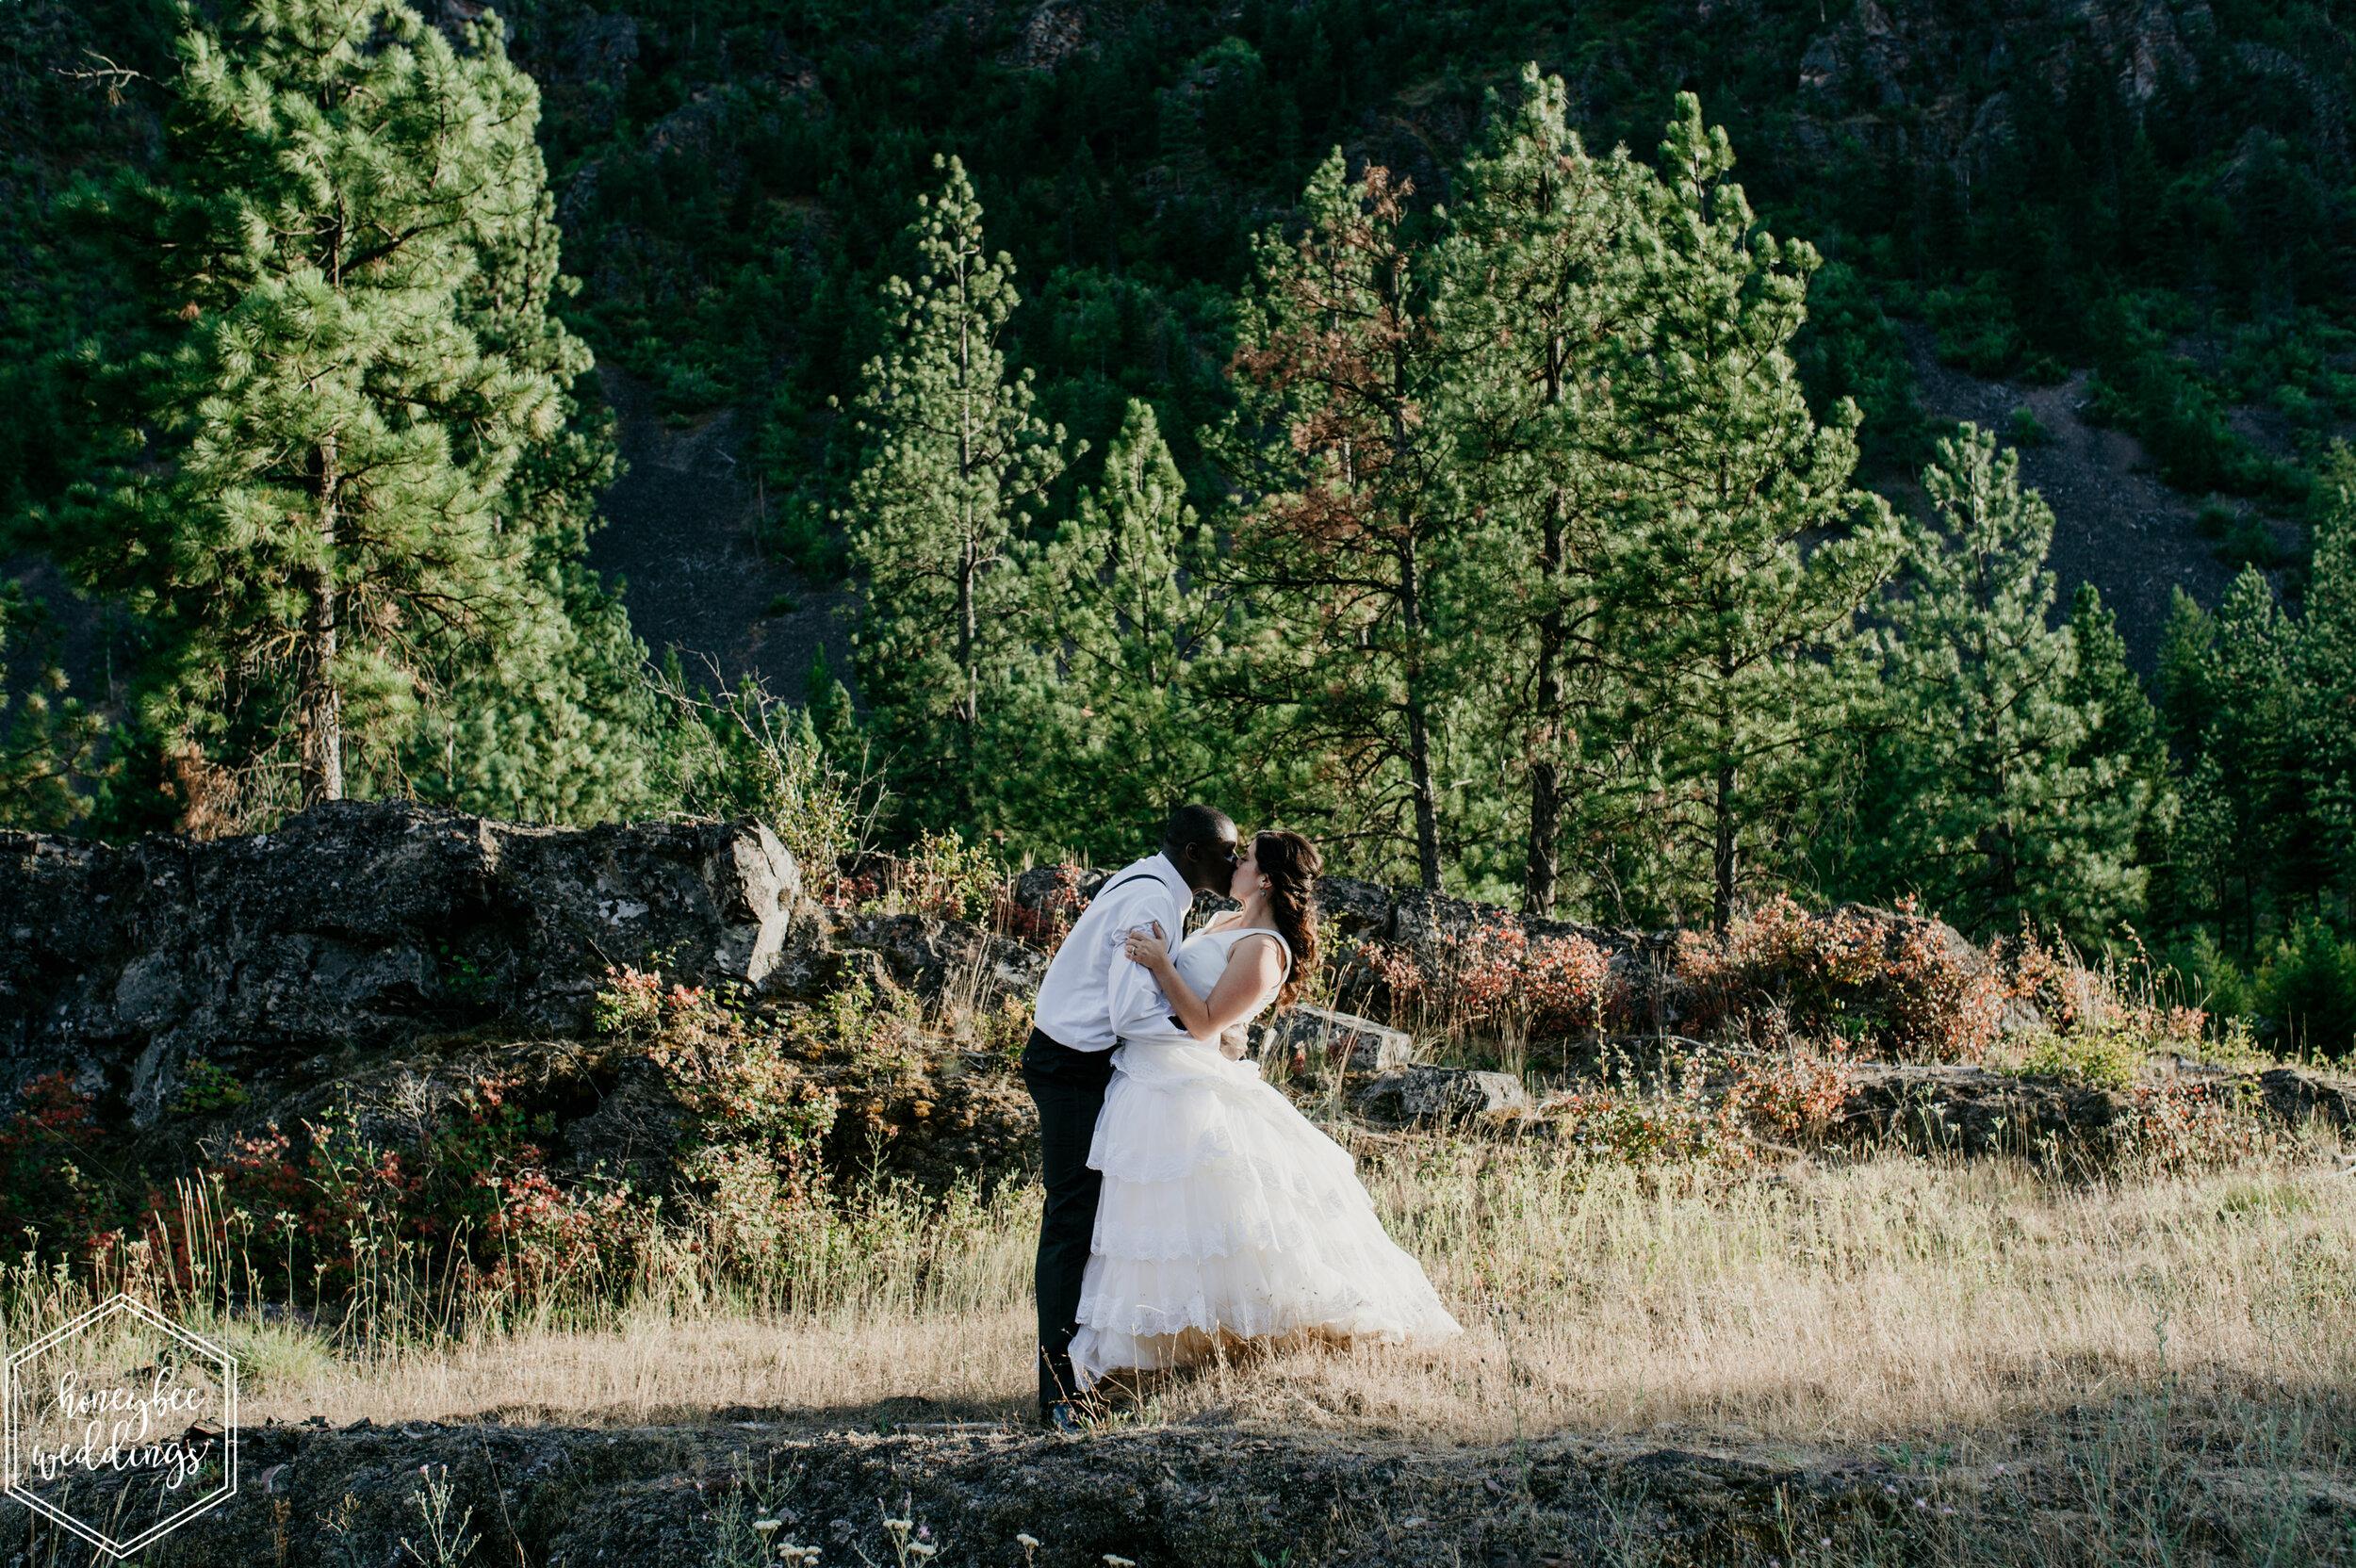 001White Raven Wedding_Montana Wedding Photographer_Rebekah & Likom_July 27, 2019-2.jpg